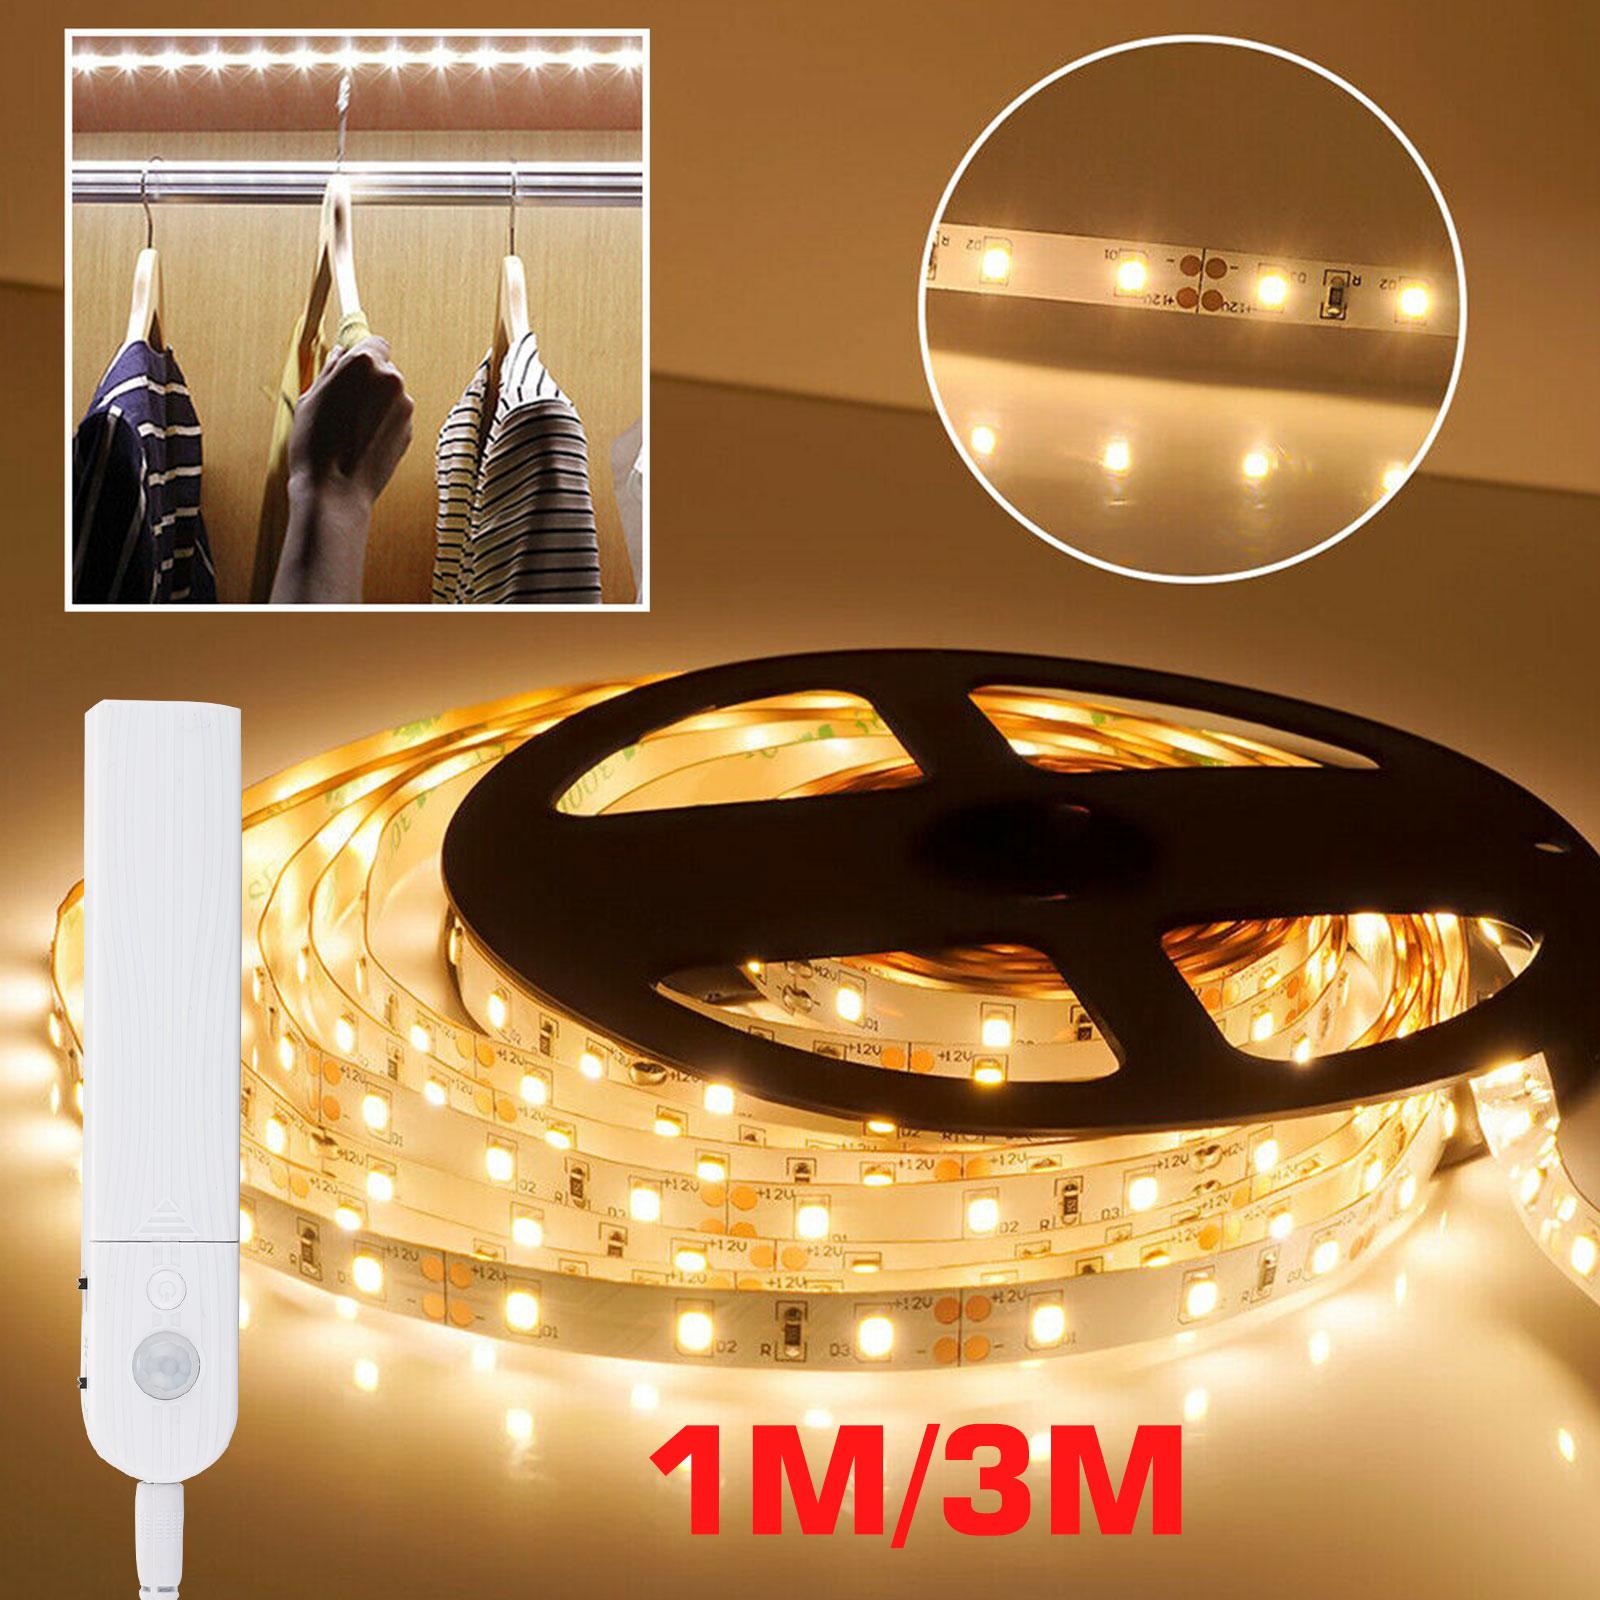 eeekit waterproof under cabinet lighting kit motion activated flexible led strip lights bar under counter lights for tv cupboard closet shelf